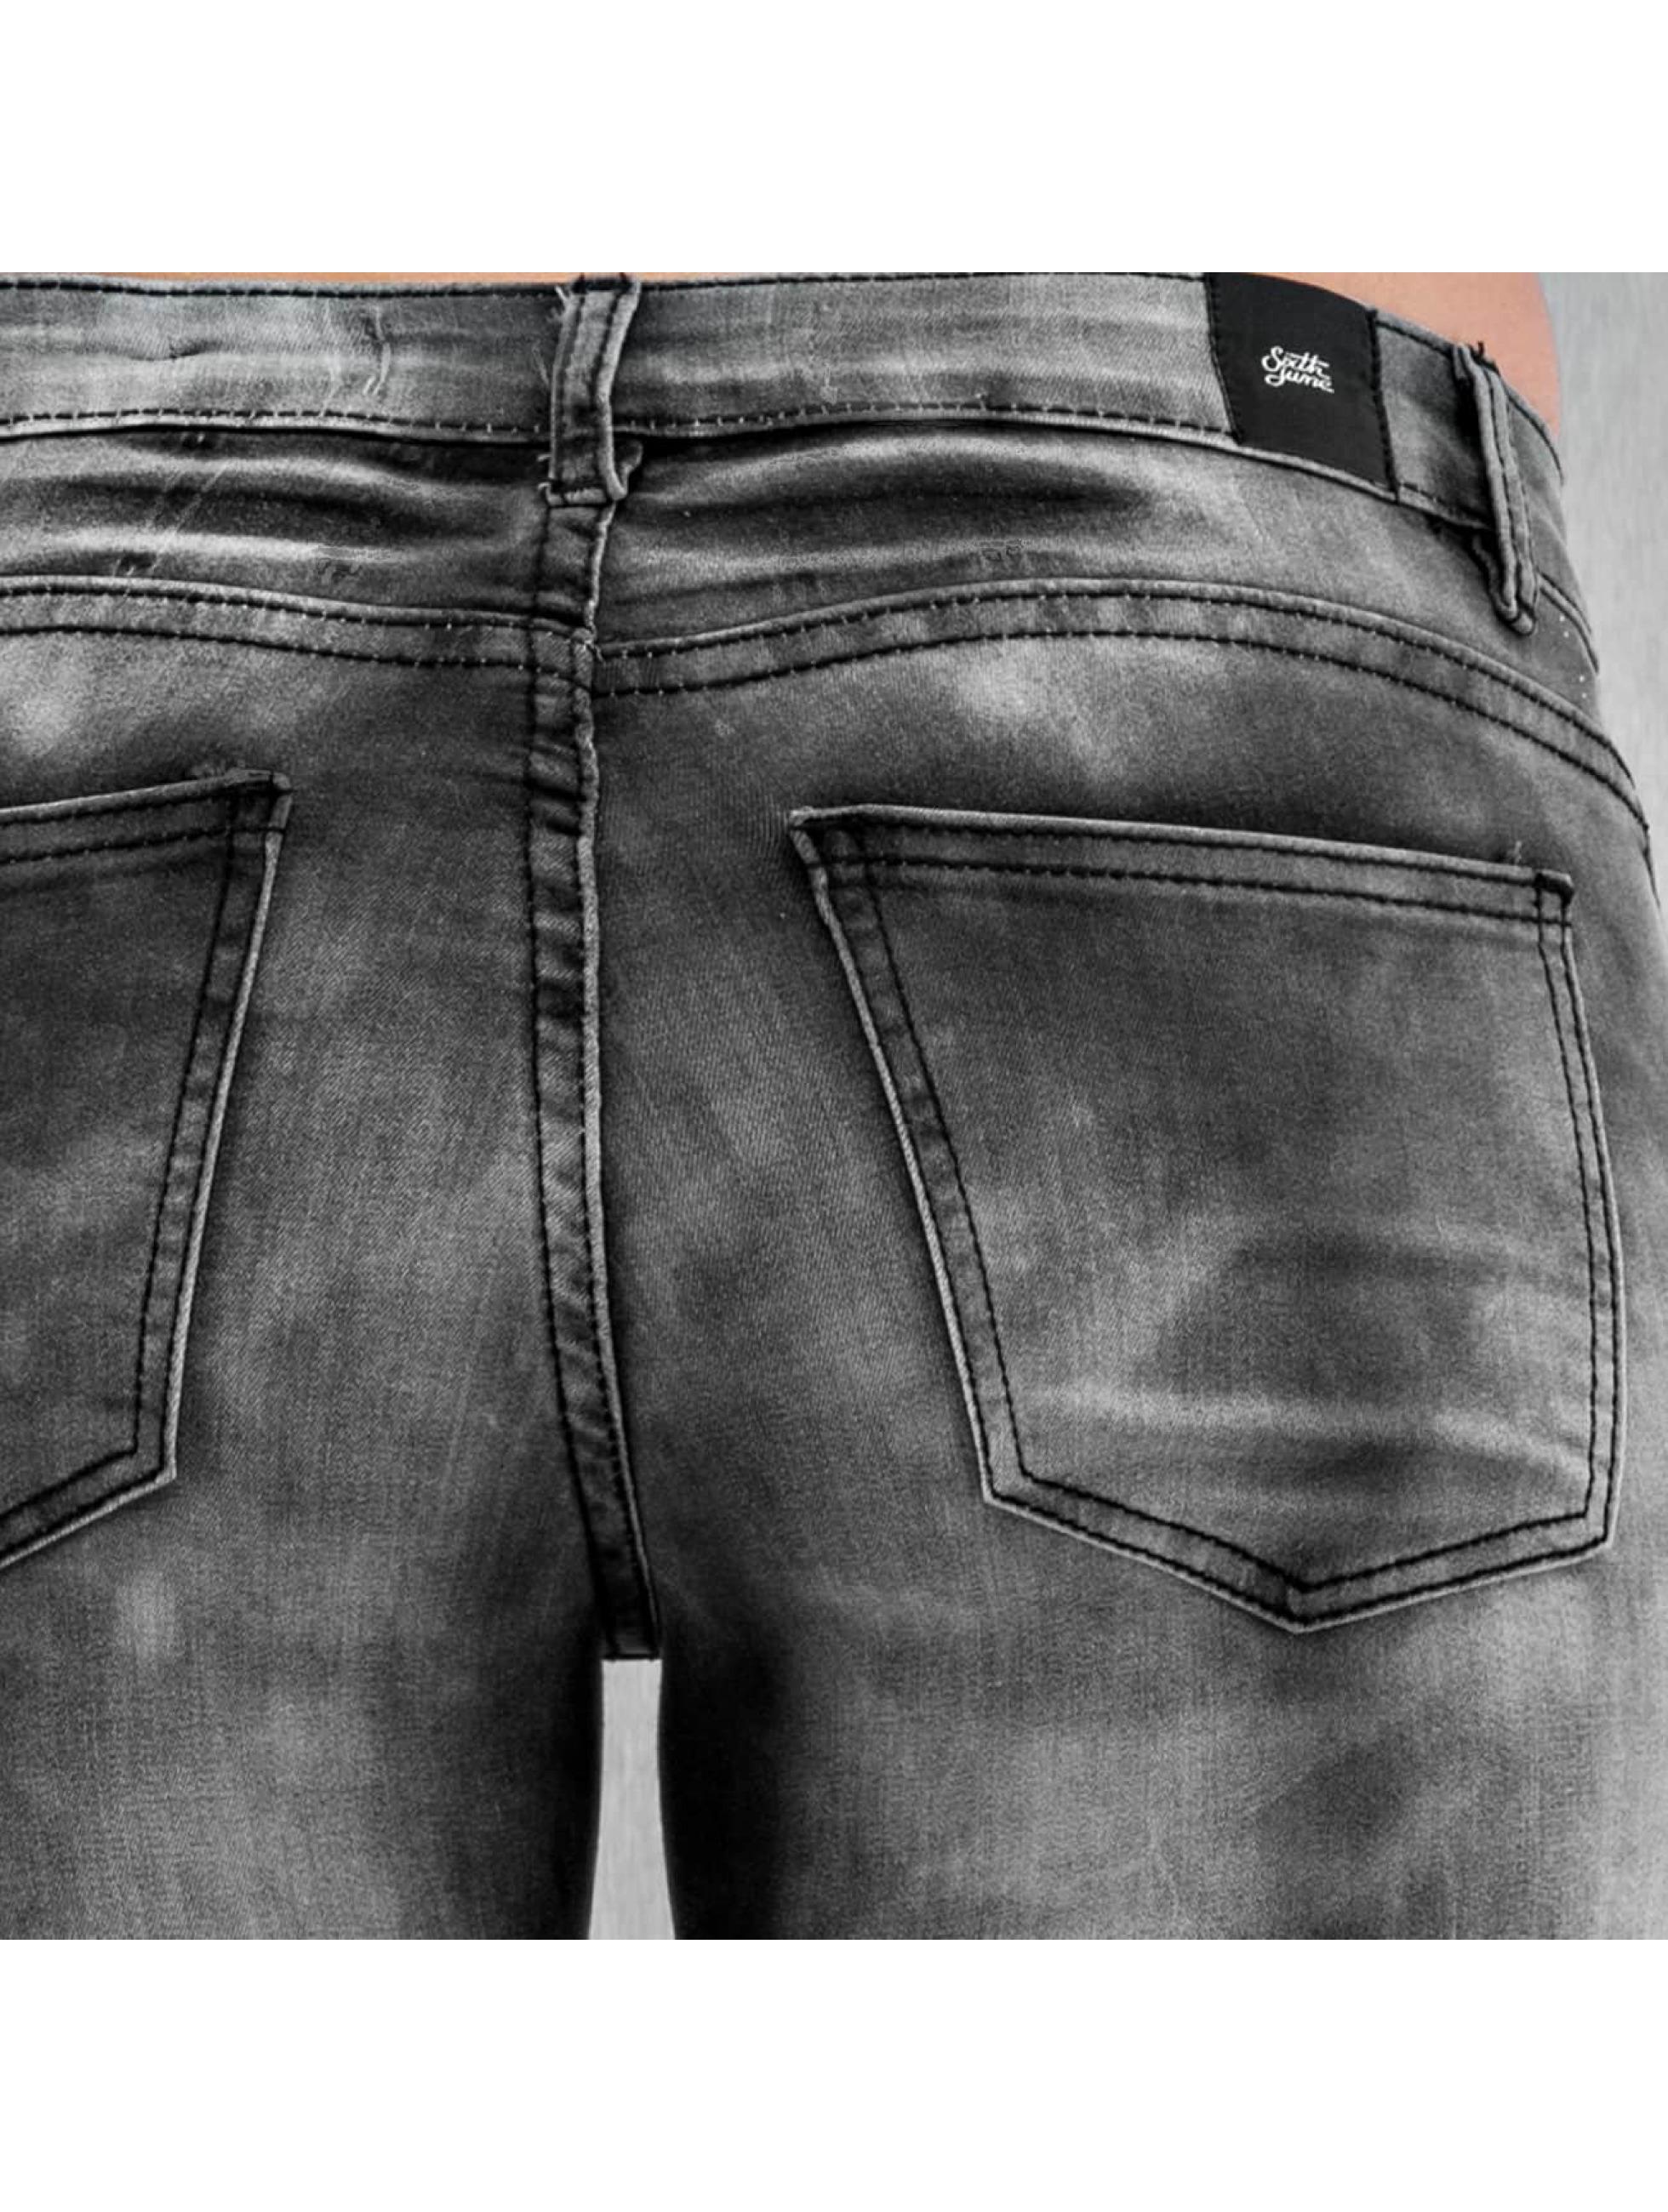 Sixth June Skinny Jeans Washed Tie and Dye Bike grau